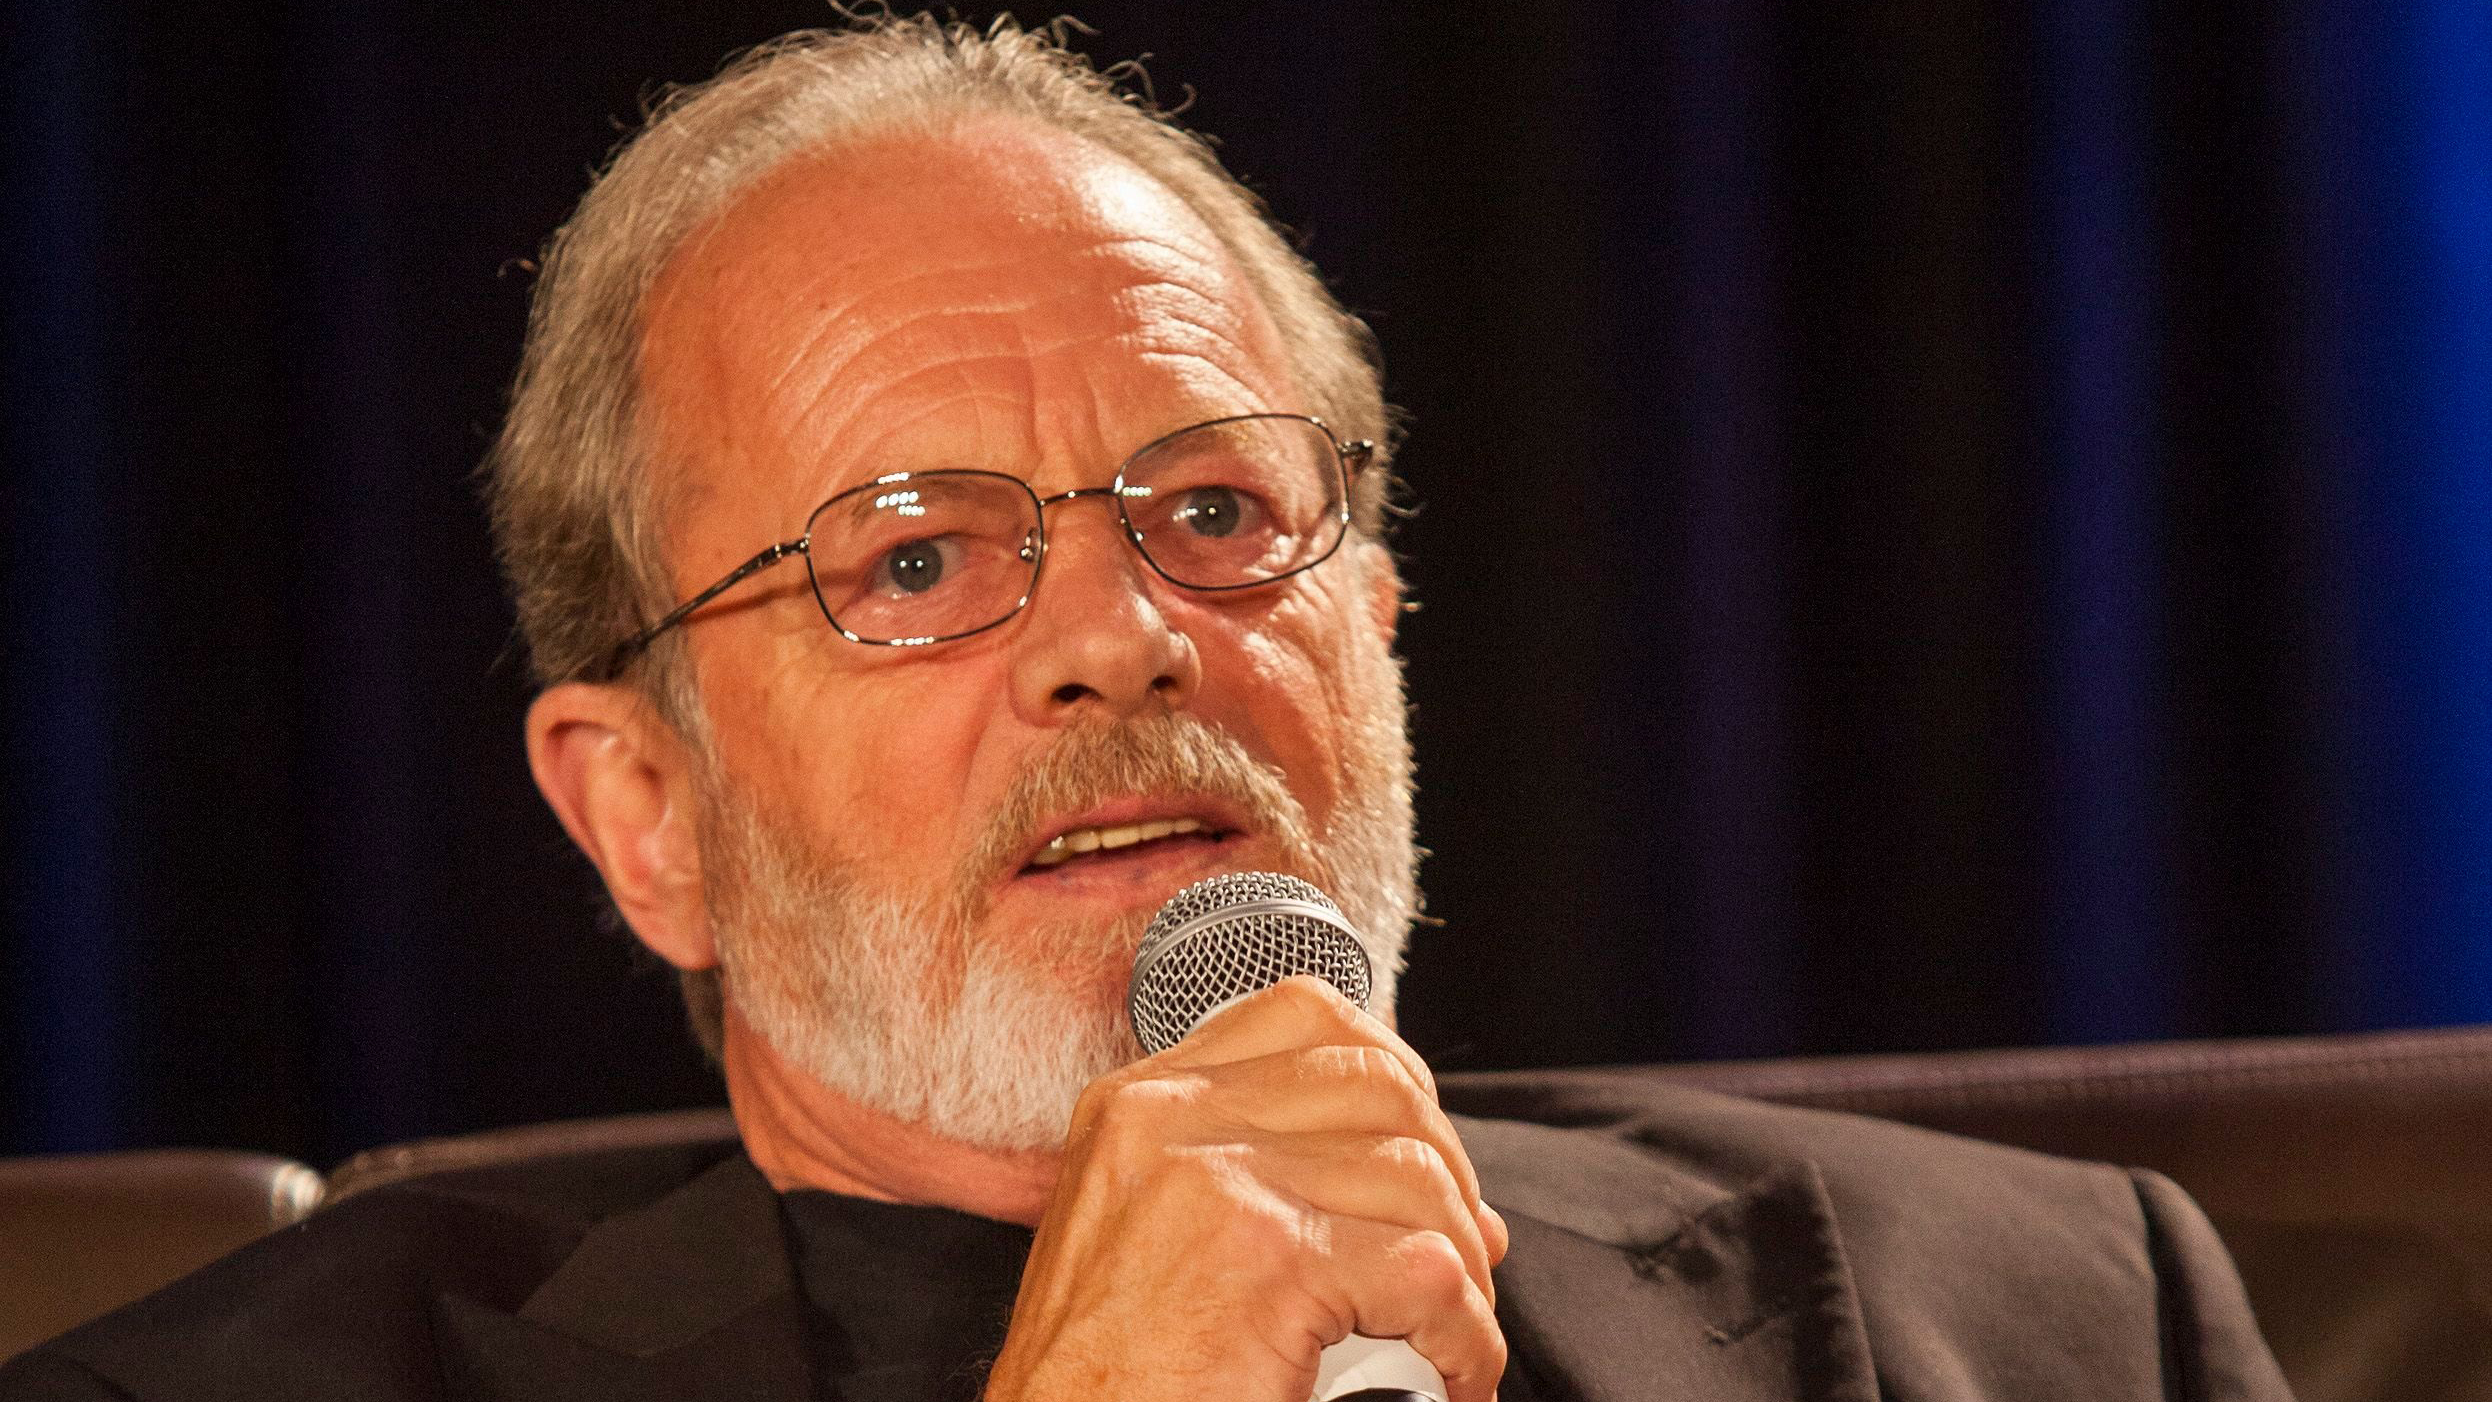 'Evil Dead 2' Star Danny Hicks Announces Stage 4 Cancer Diagnosis